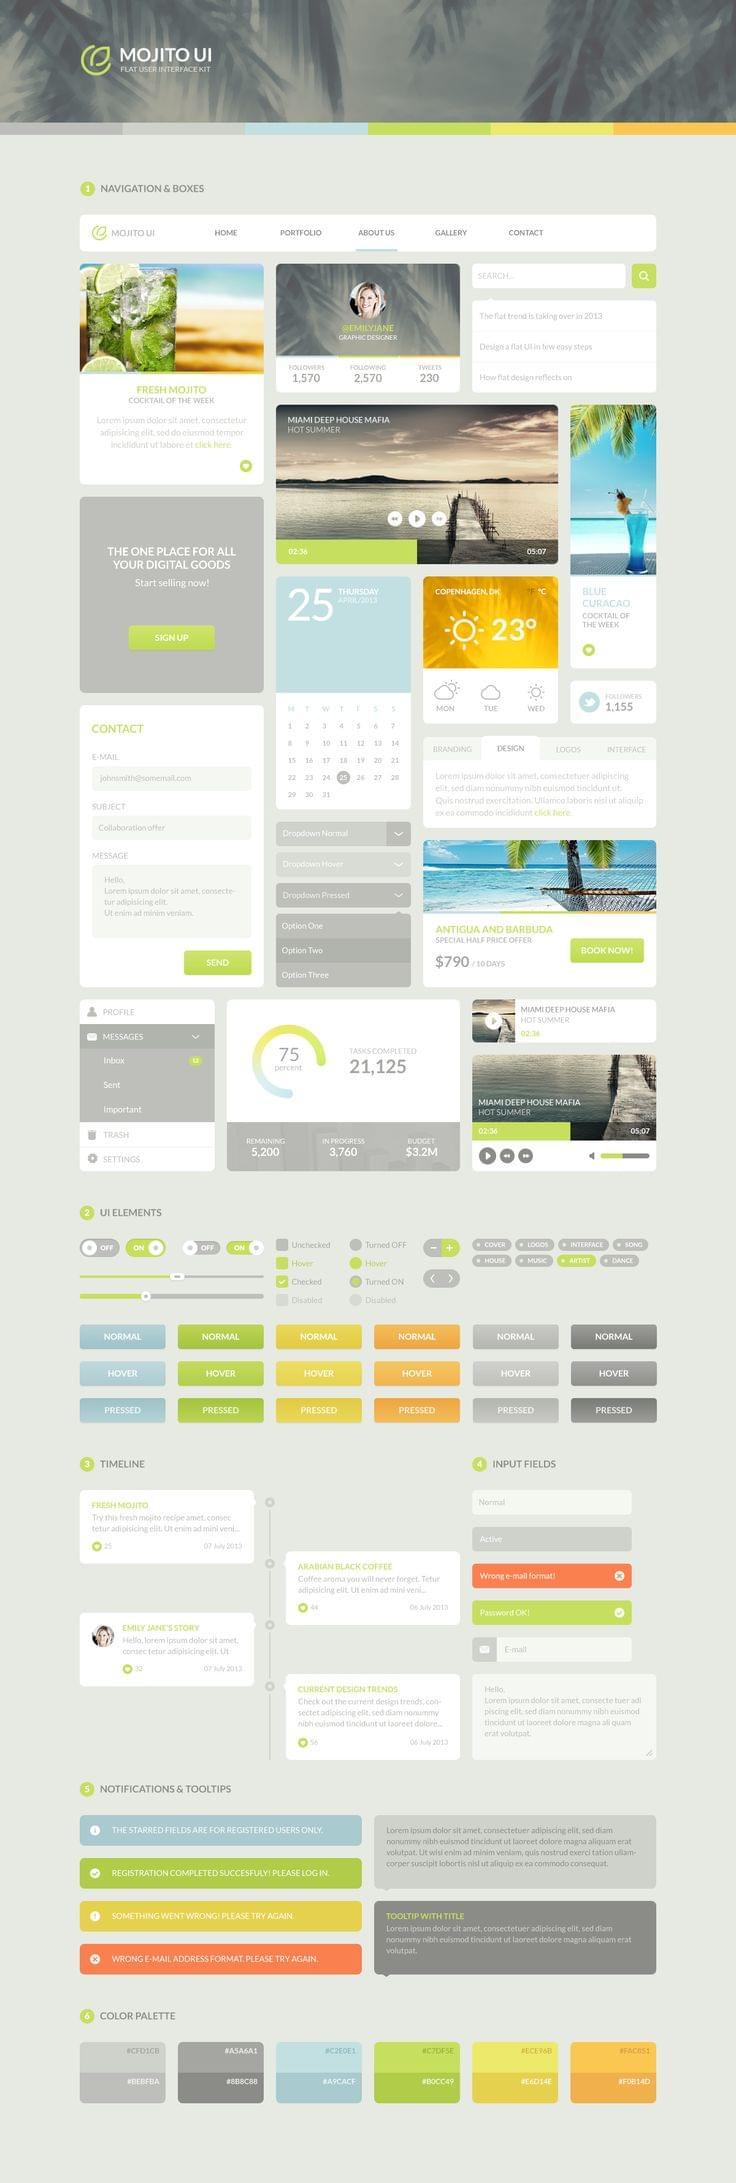 Flat UI kit Mojito UI